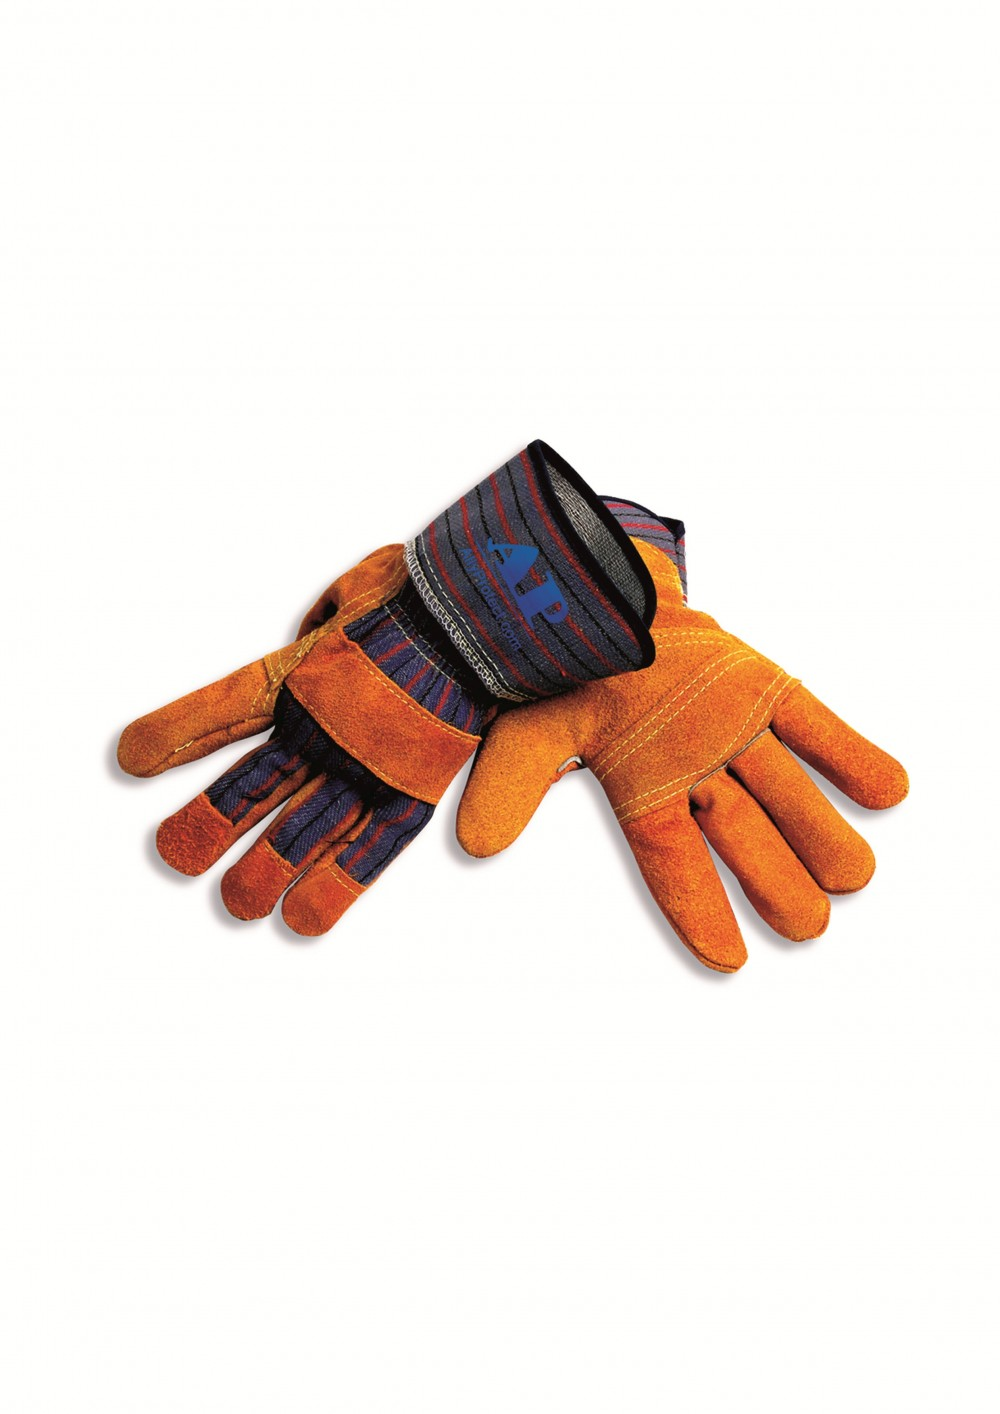 AP-1511友盟金黄色皮驳掌手套